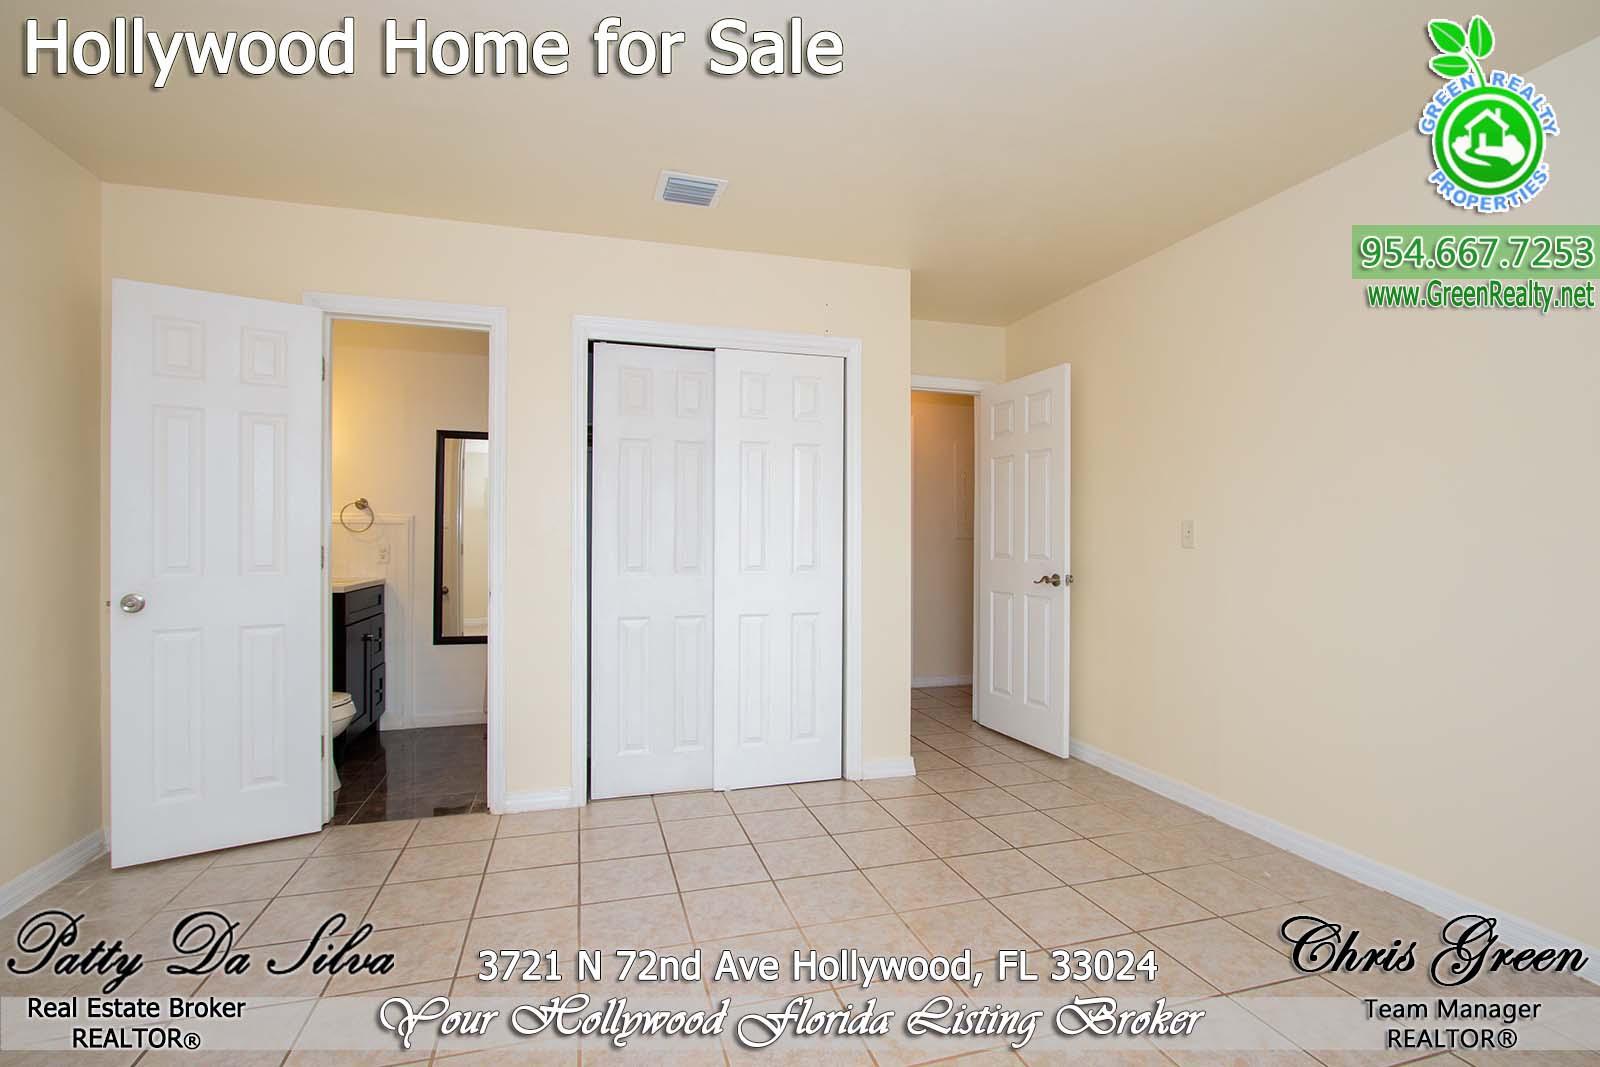 12 Hollywood Florida Real Estate Listing Patty Da Silva Green Realty properties (13)